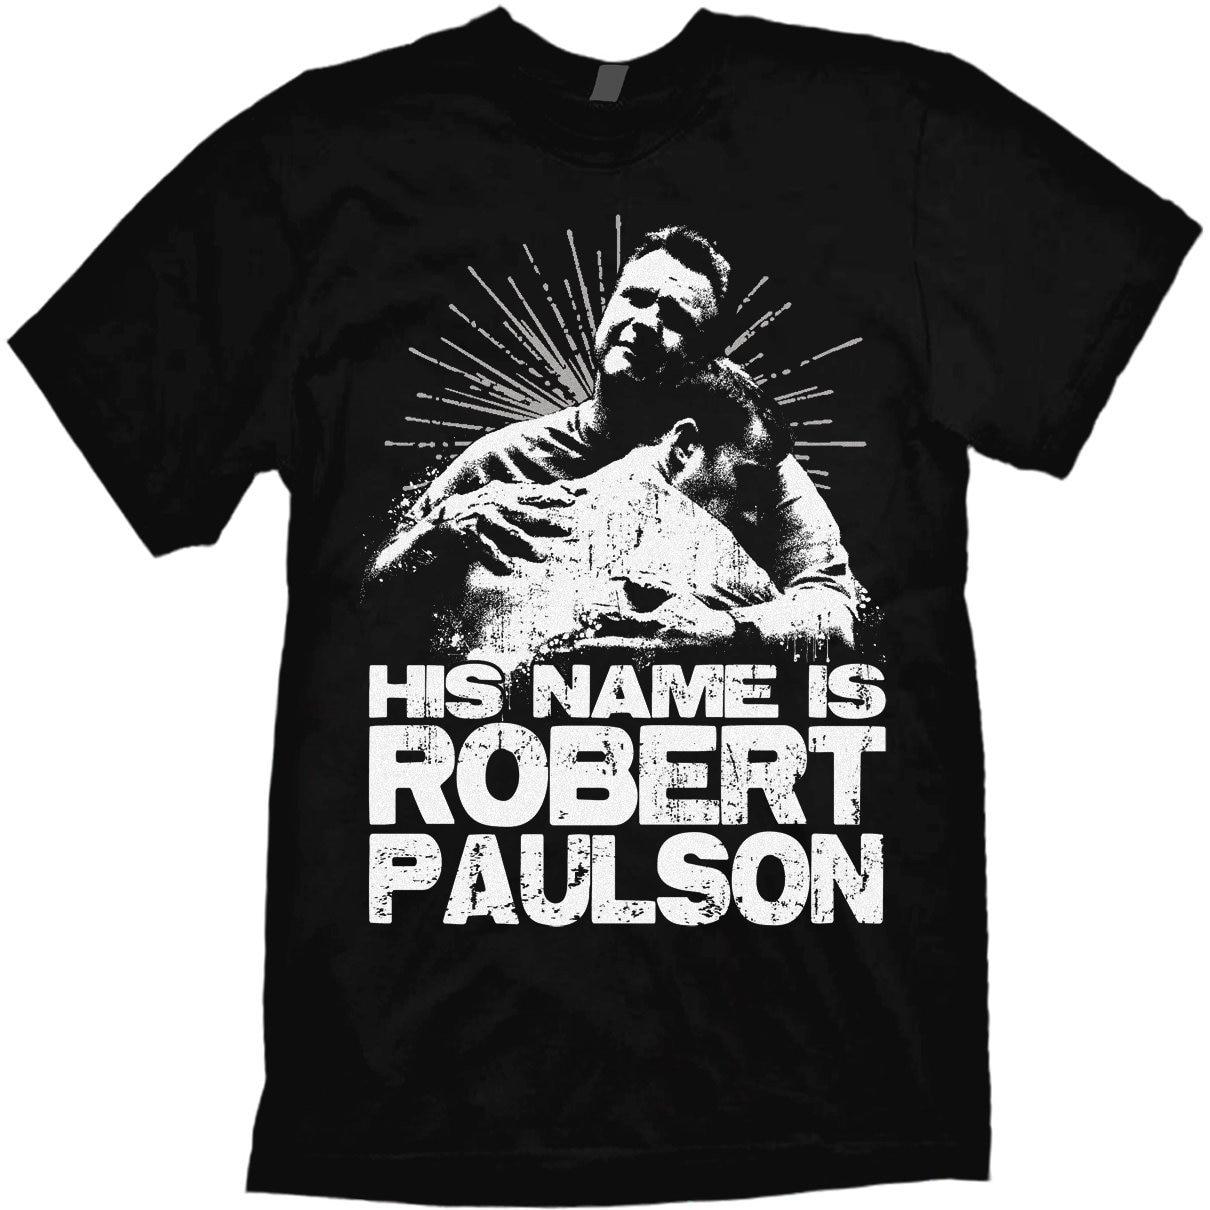 "Fight Club T-shirt ""Robert Paulson"" Based on The 1999 Movie Summer New Print Man Cotton Fashion Cotton Fashion Men T Shirt"